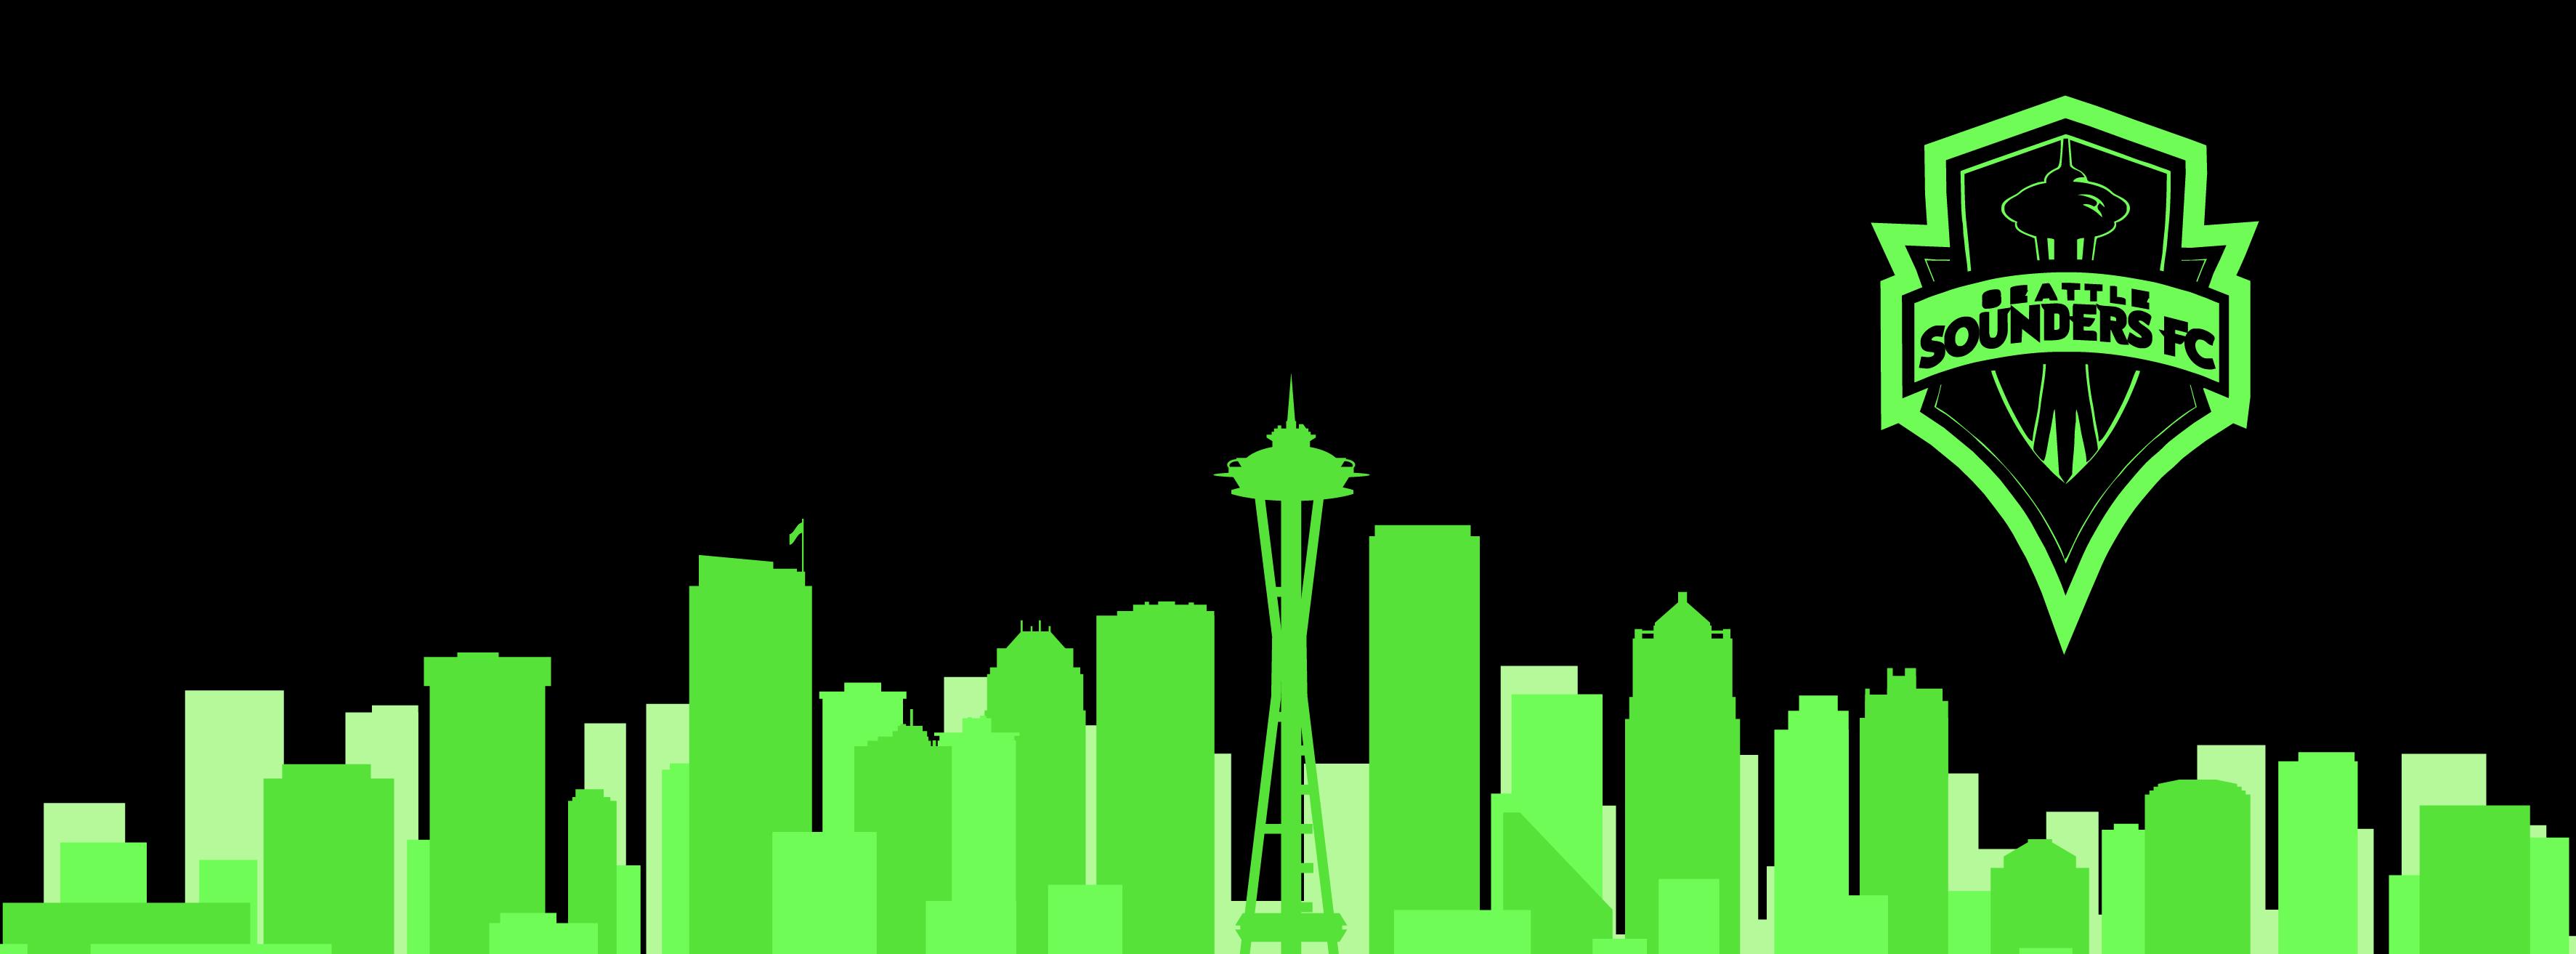 Seattle Sounders IPhone Wallpaper 3546x1313 968UO8K   Picseriocom 3546x1313